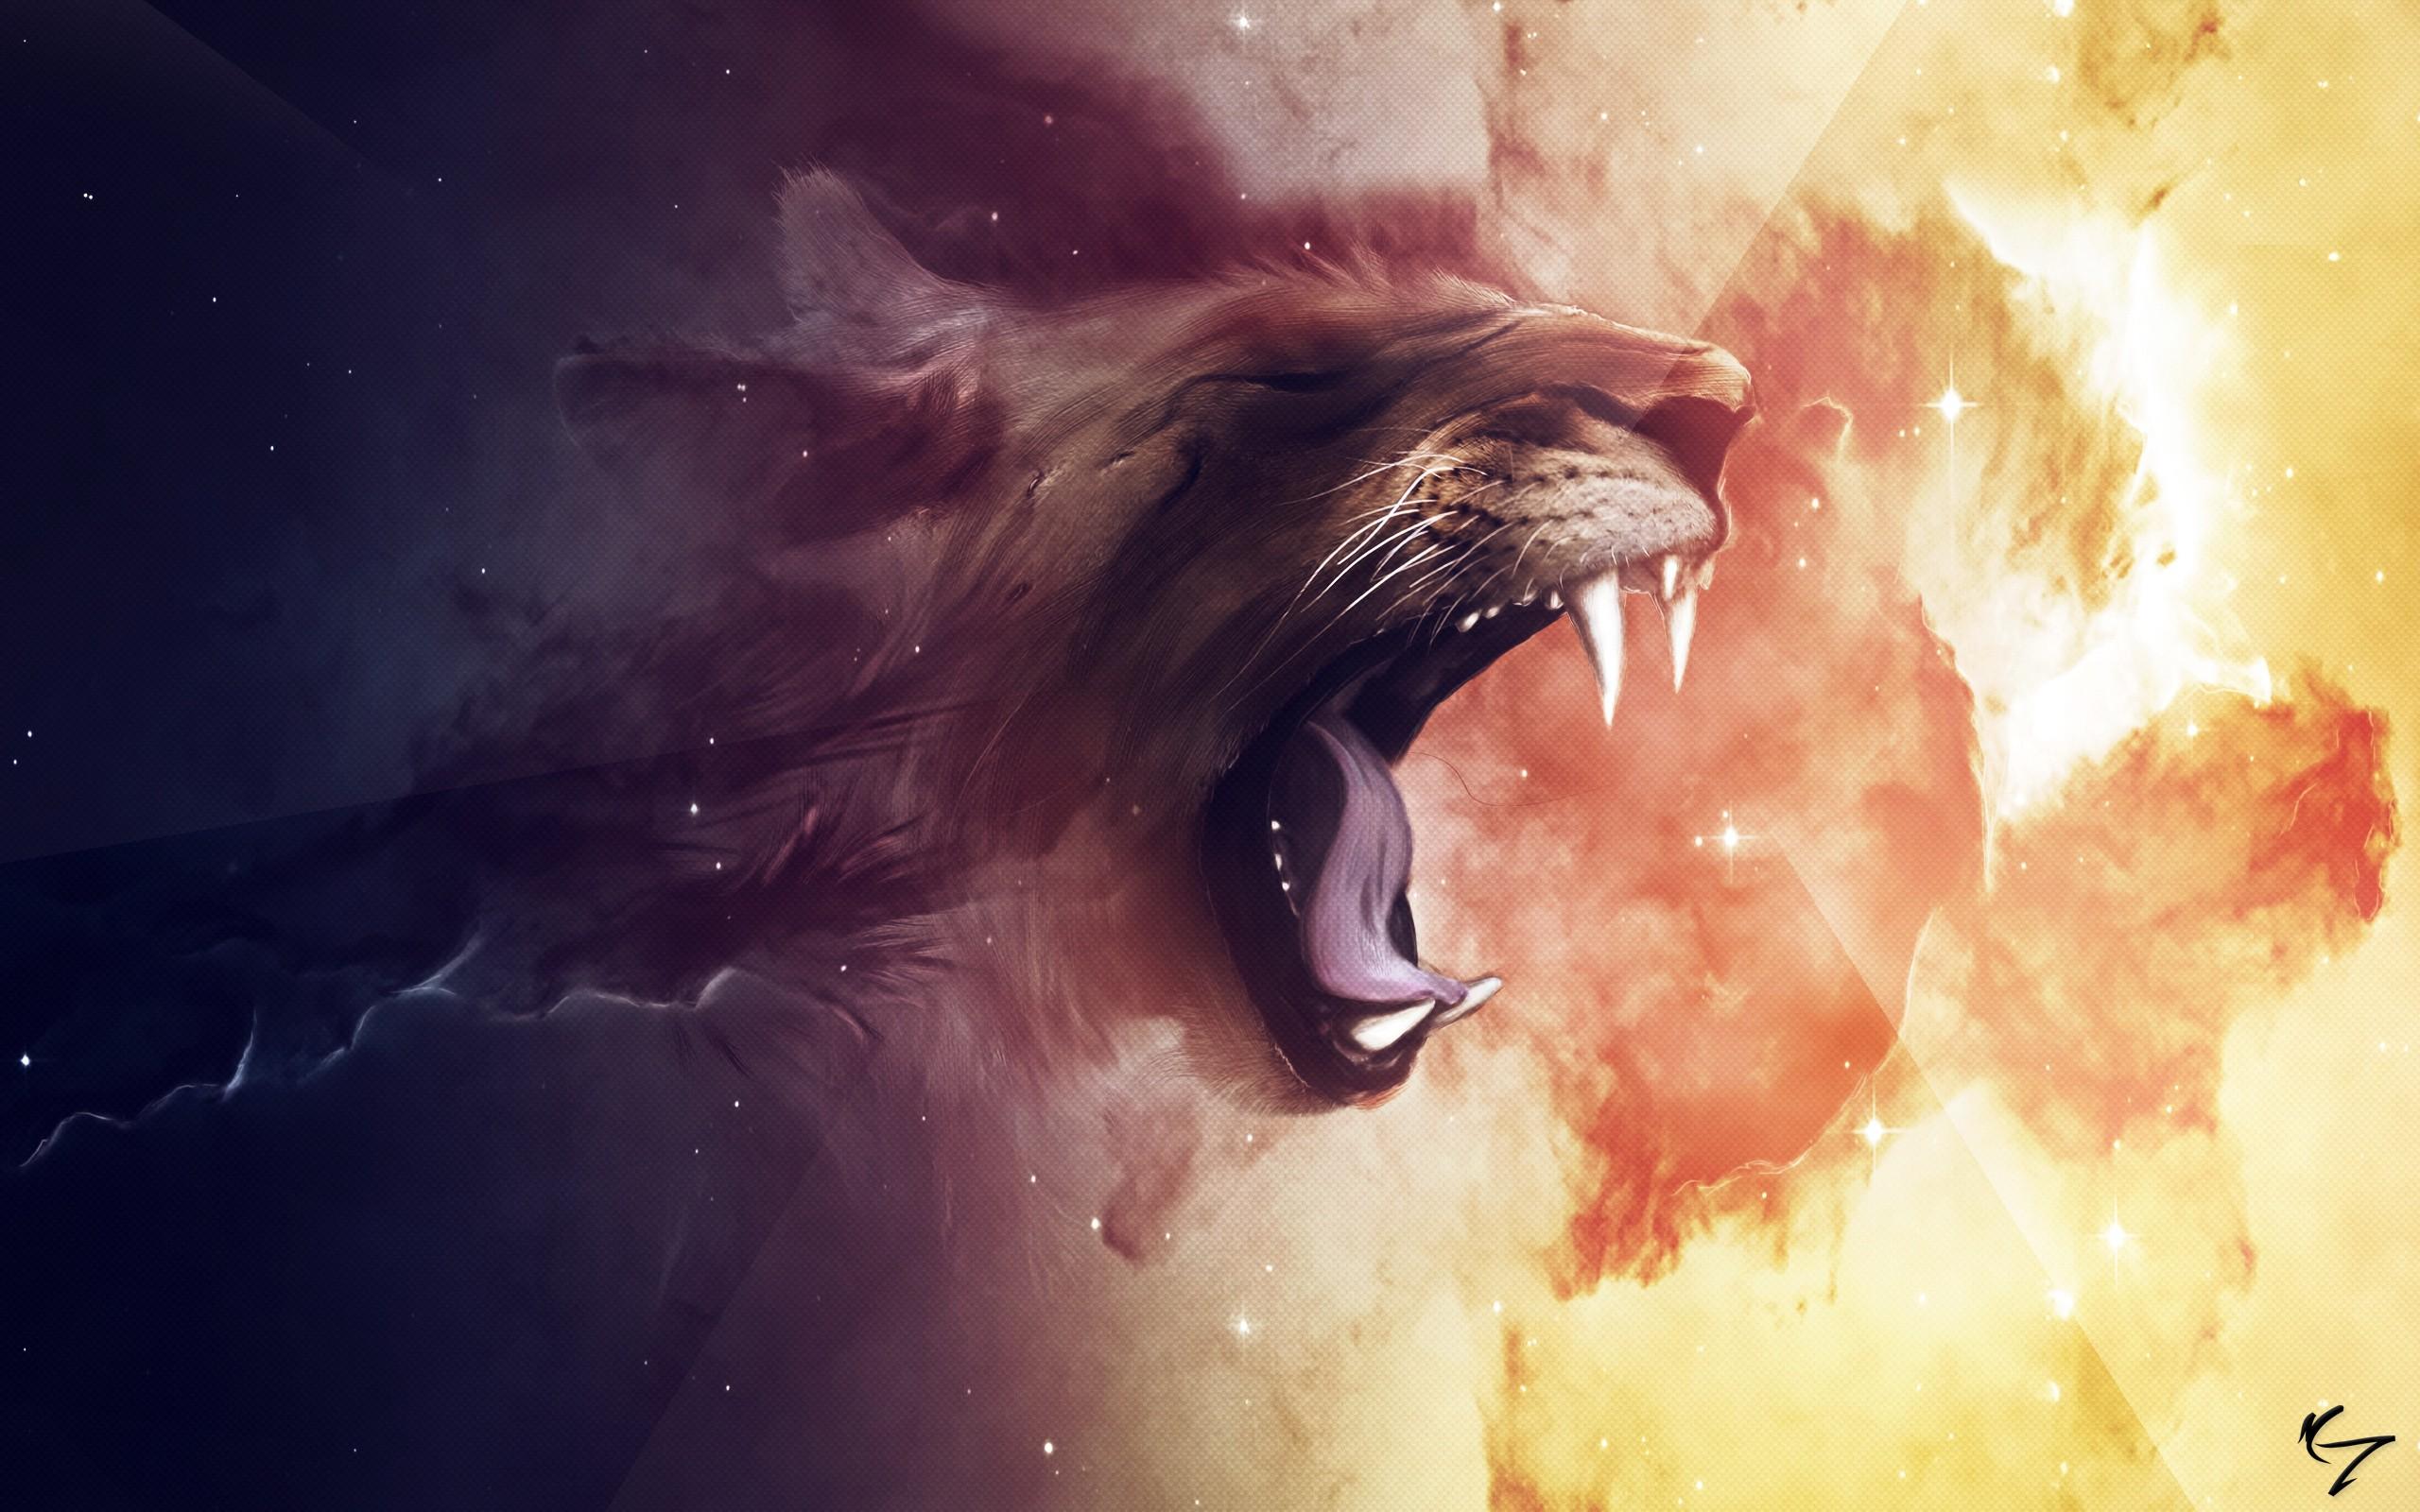 General 2560x1600 artwork fantasy art abstract space lion clouds stars animals Claudio Testa